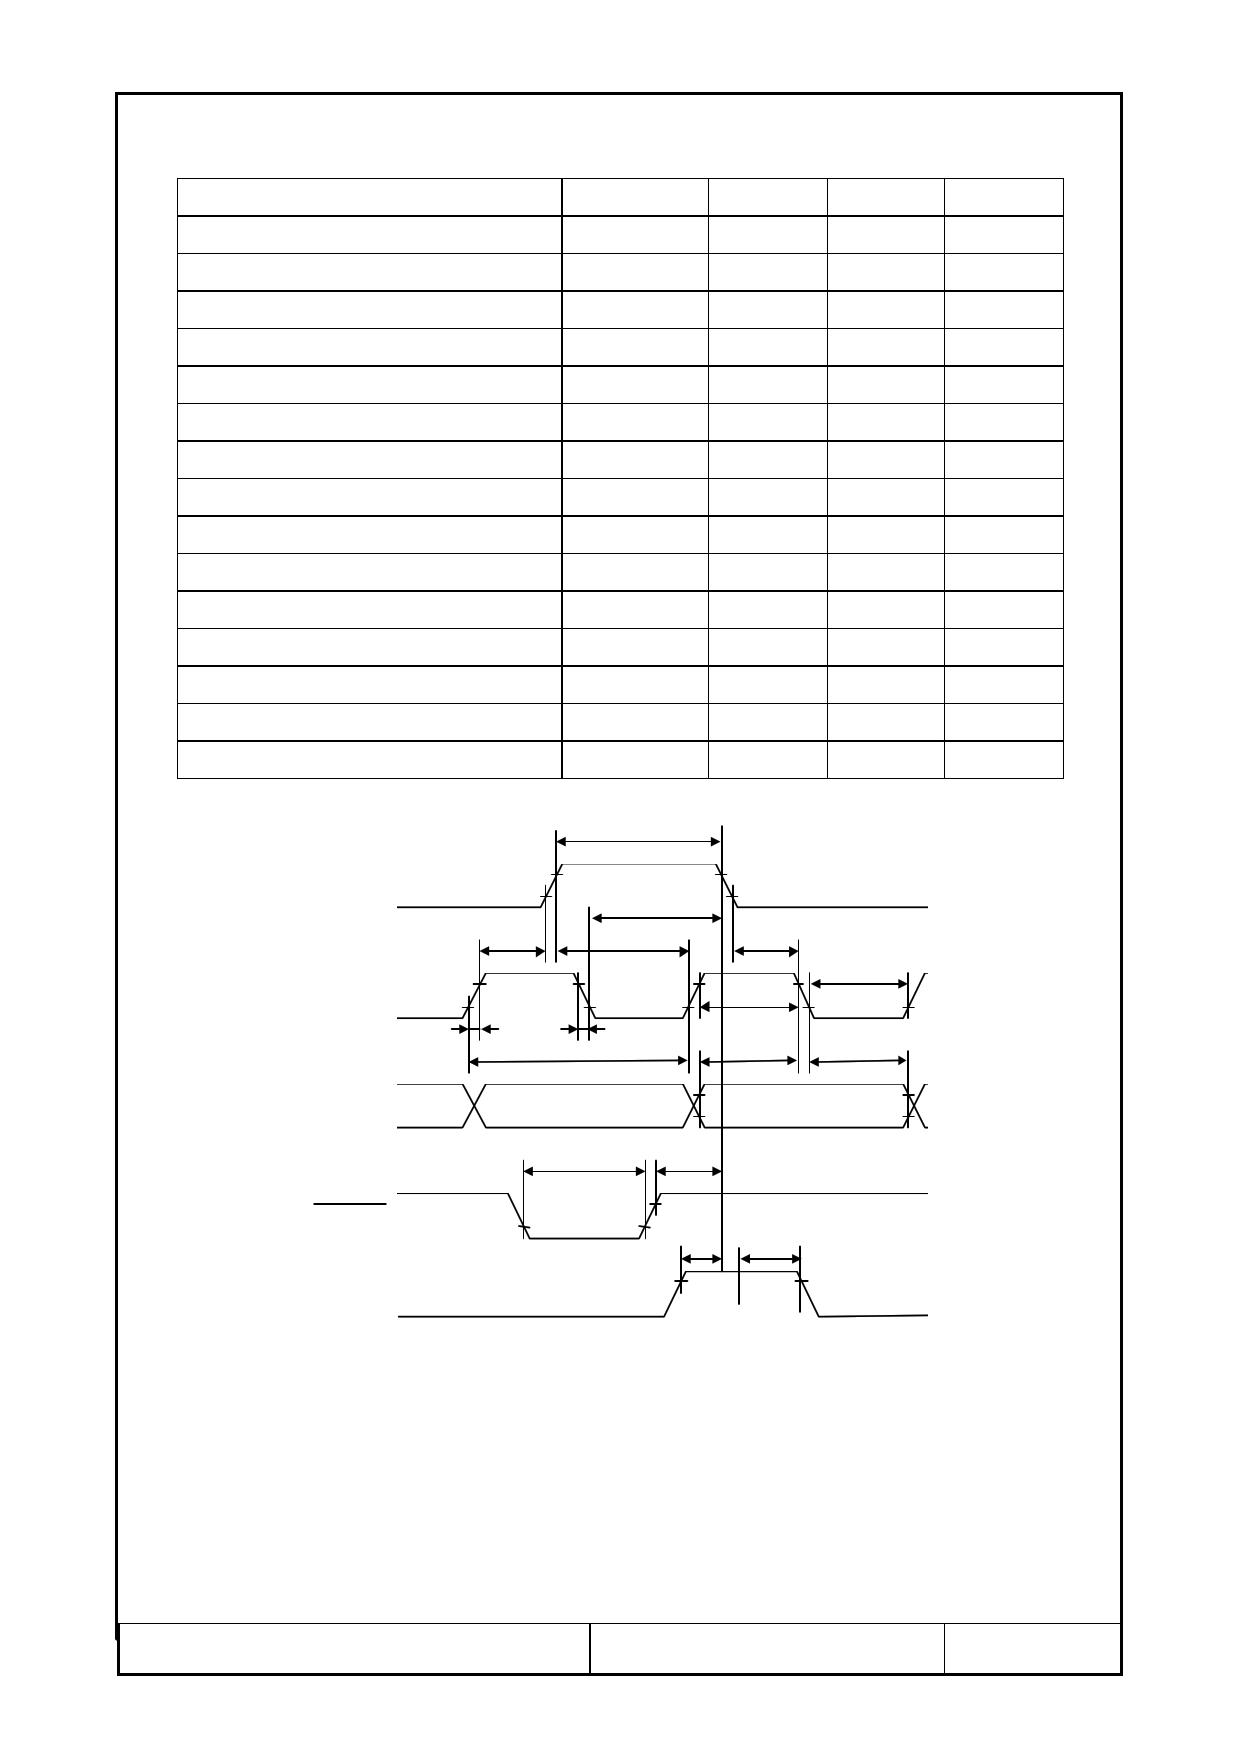 F-51900NCU-FW-ACN pdf, arduino